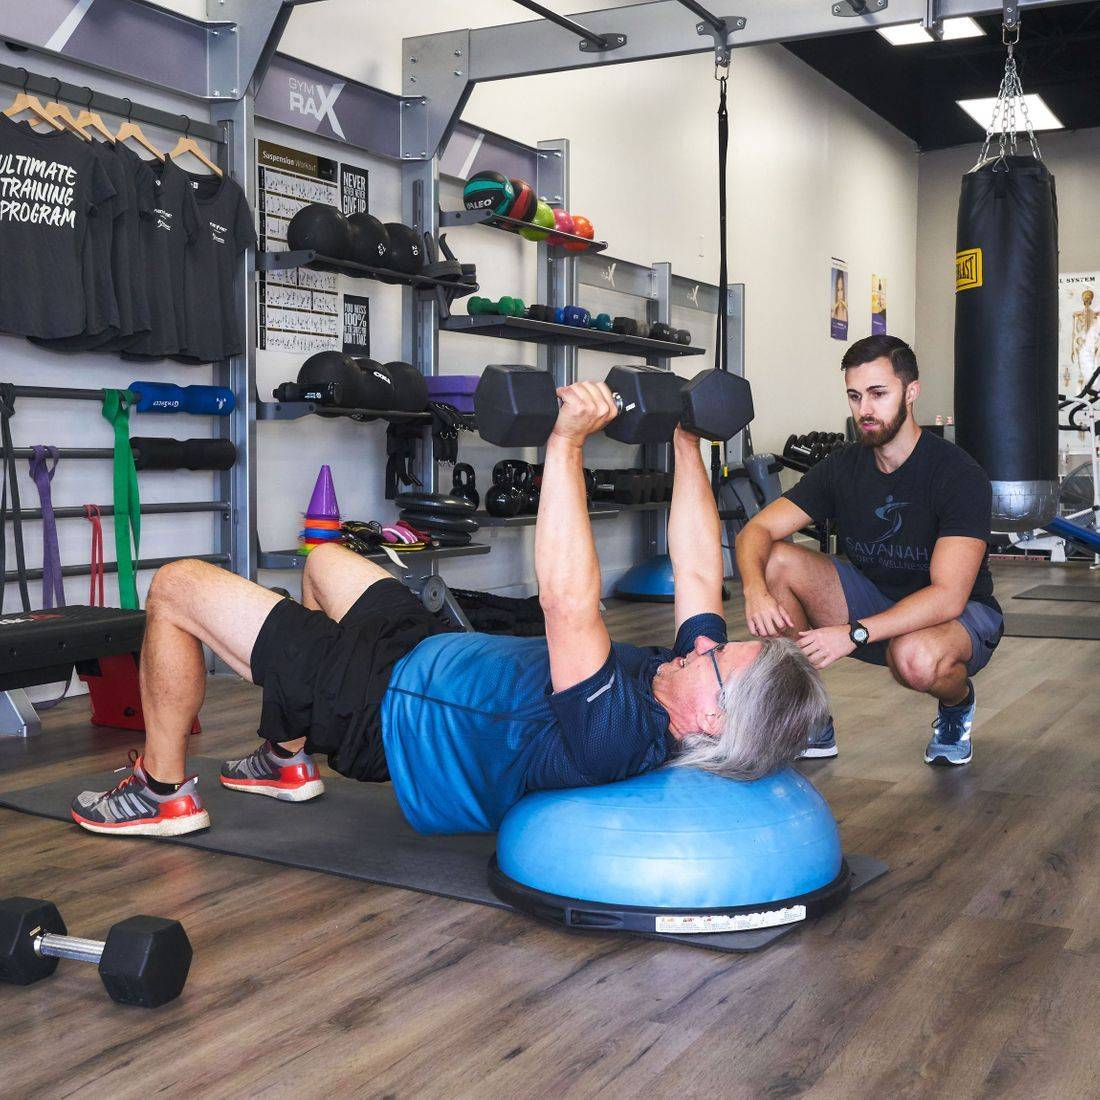 personal training savannah ga, functional training savannah ga, personal trainer near me, personal trainer savannah